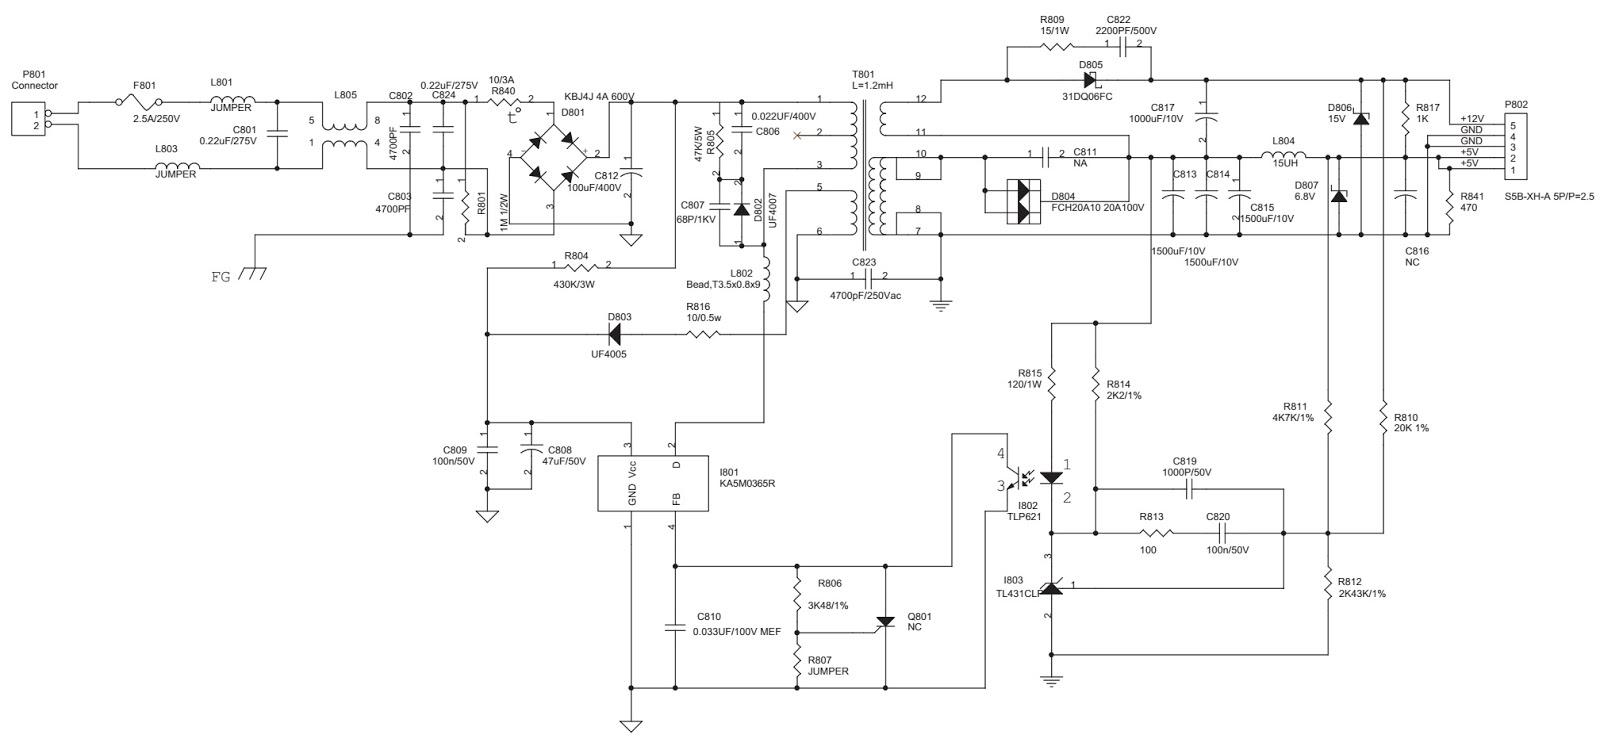 Array acer al512 acer al513 15 inch lcd monitor u2013 circuit diagram rh electronicshelponline blogspot